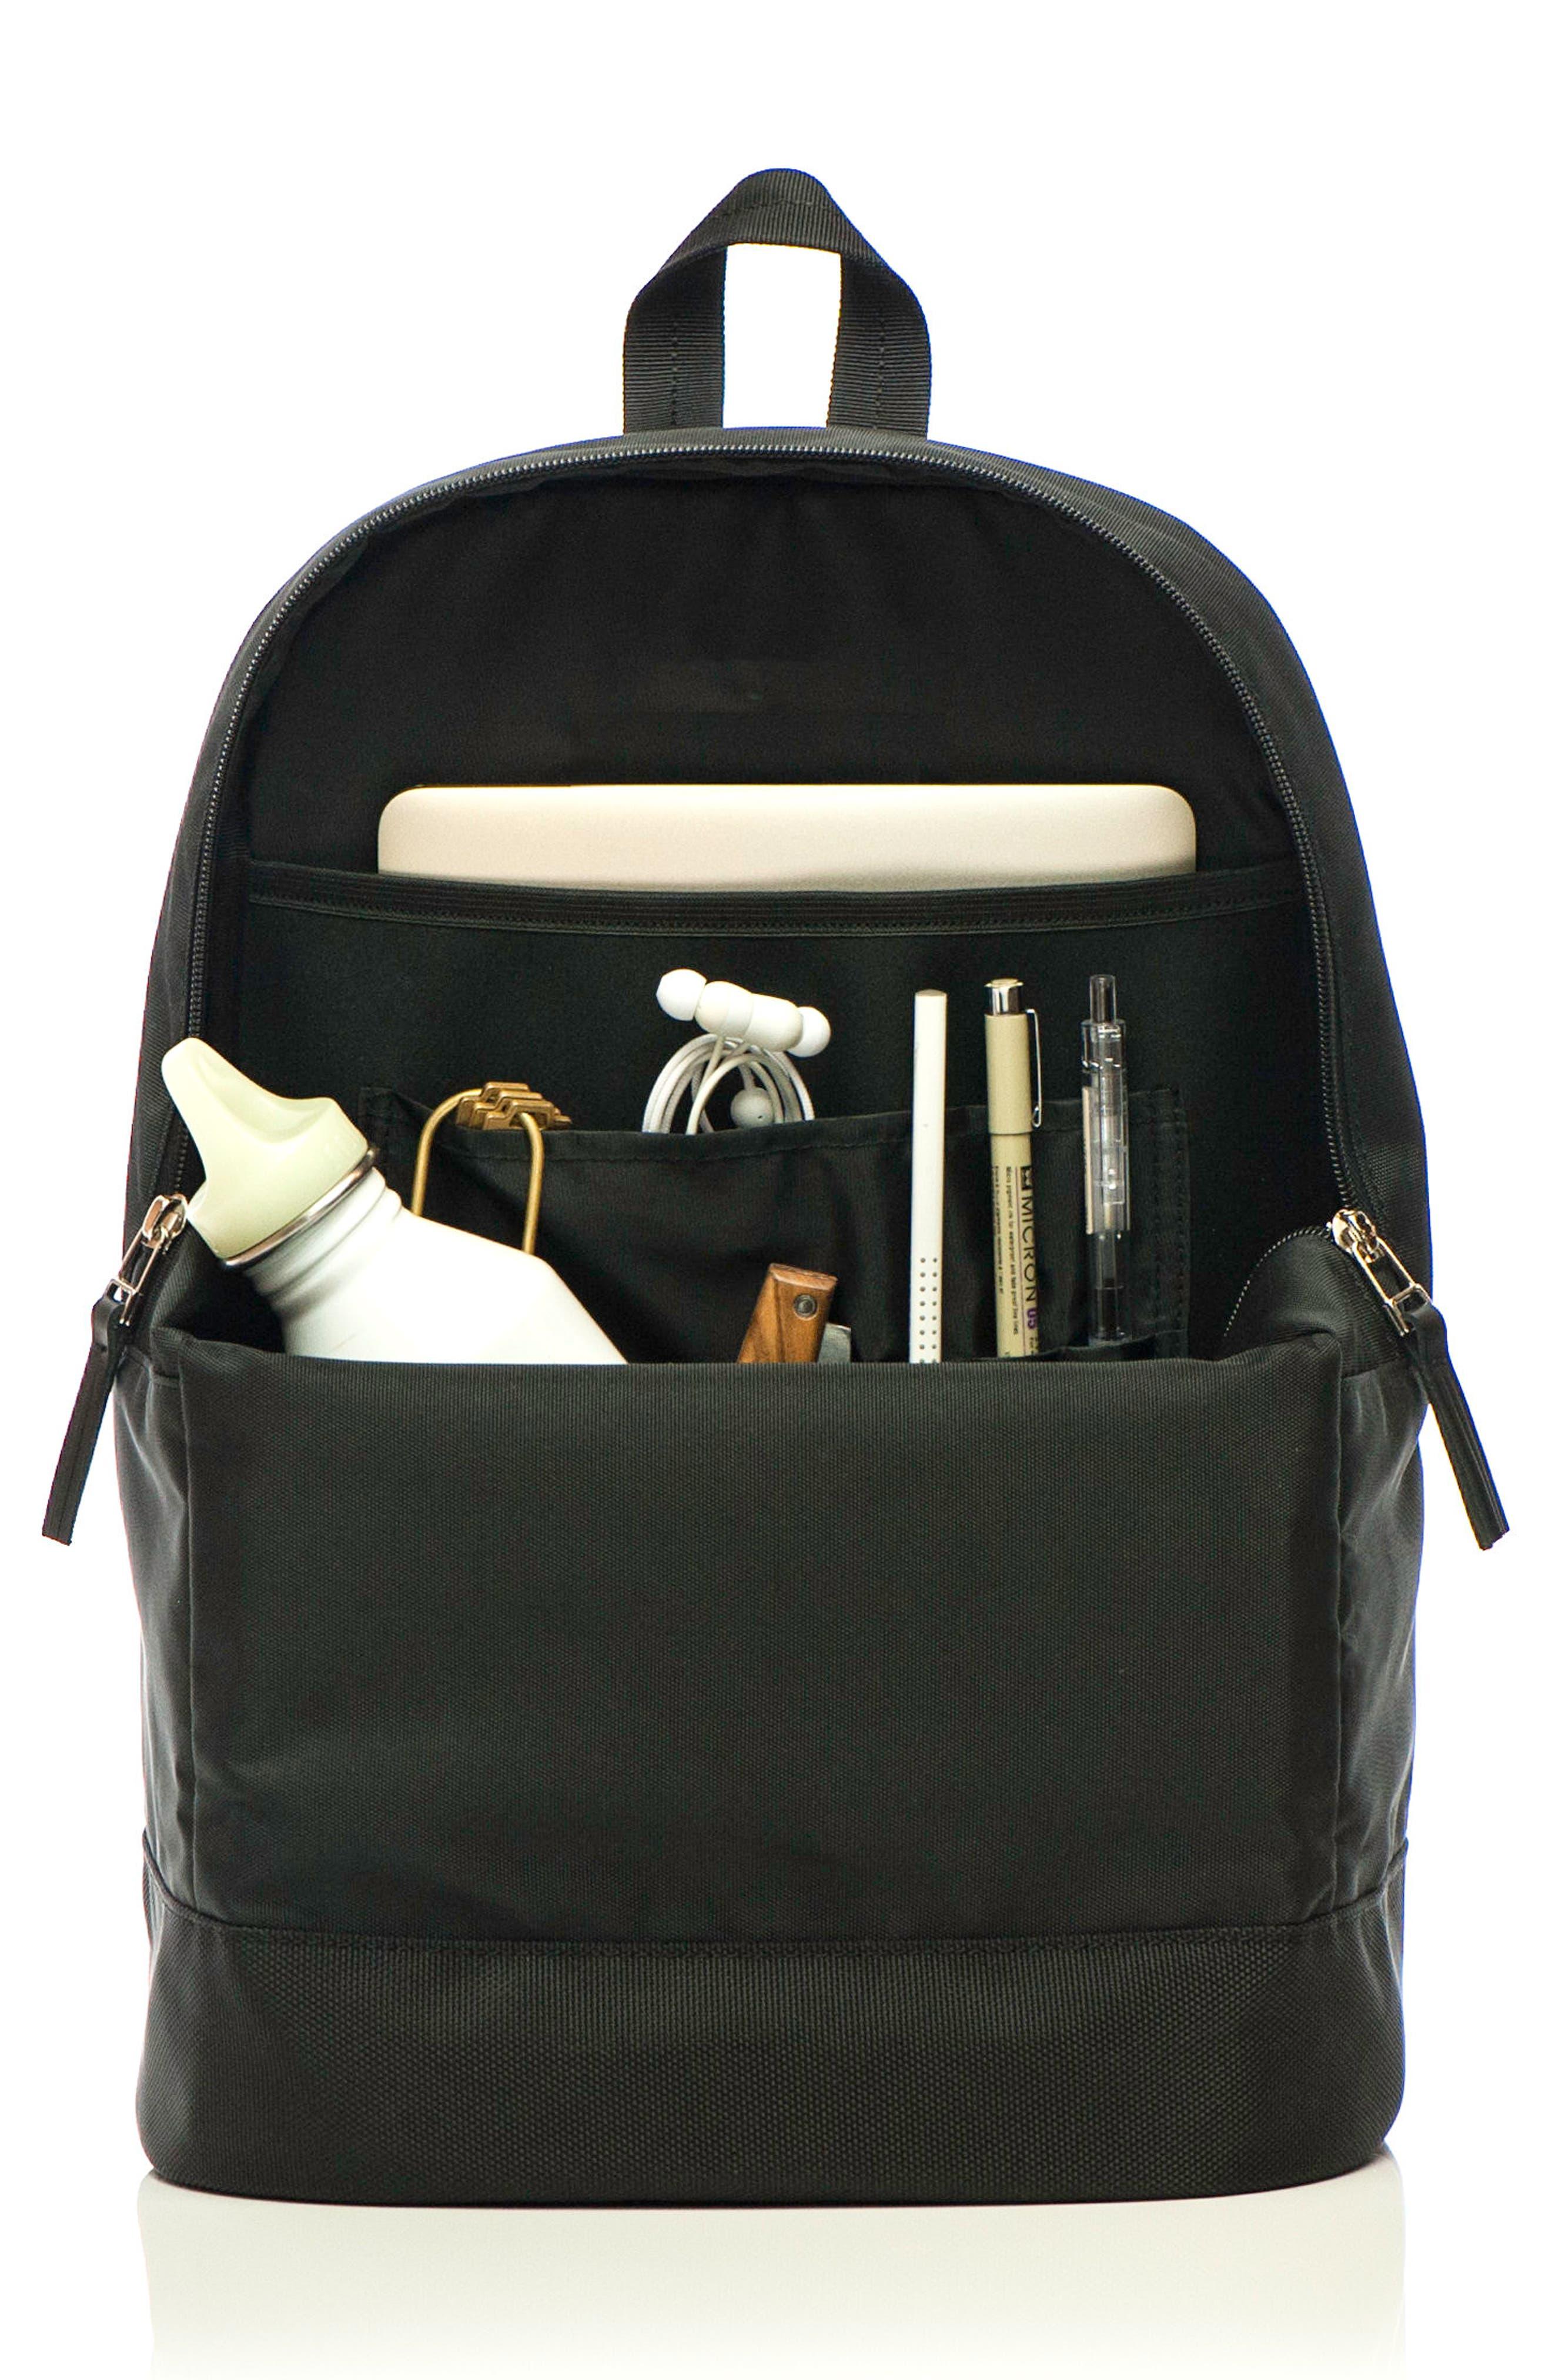 Tomcat Backpack,                             Alternate thumbnail 6, color,                             Black